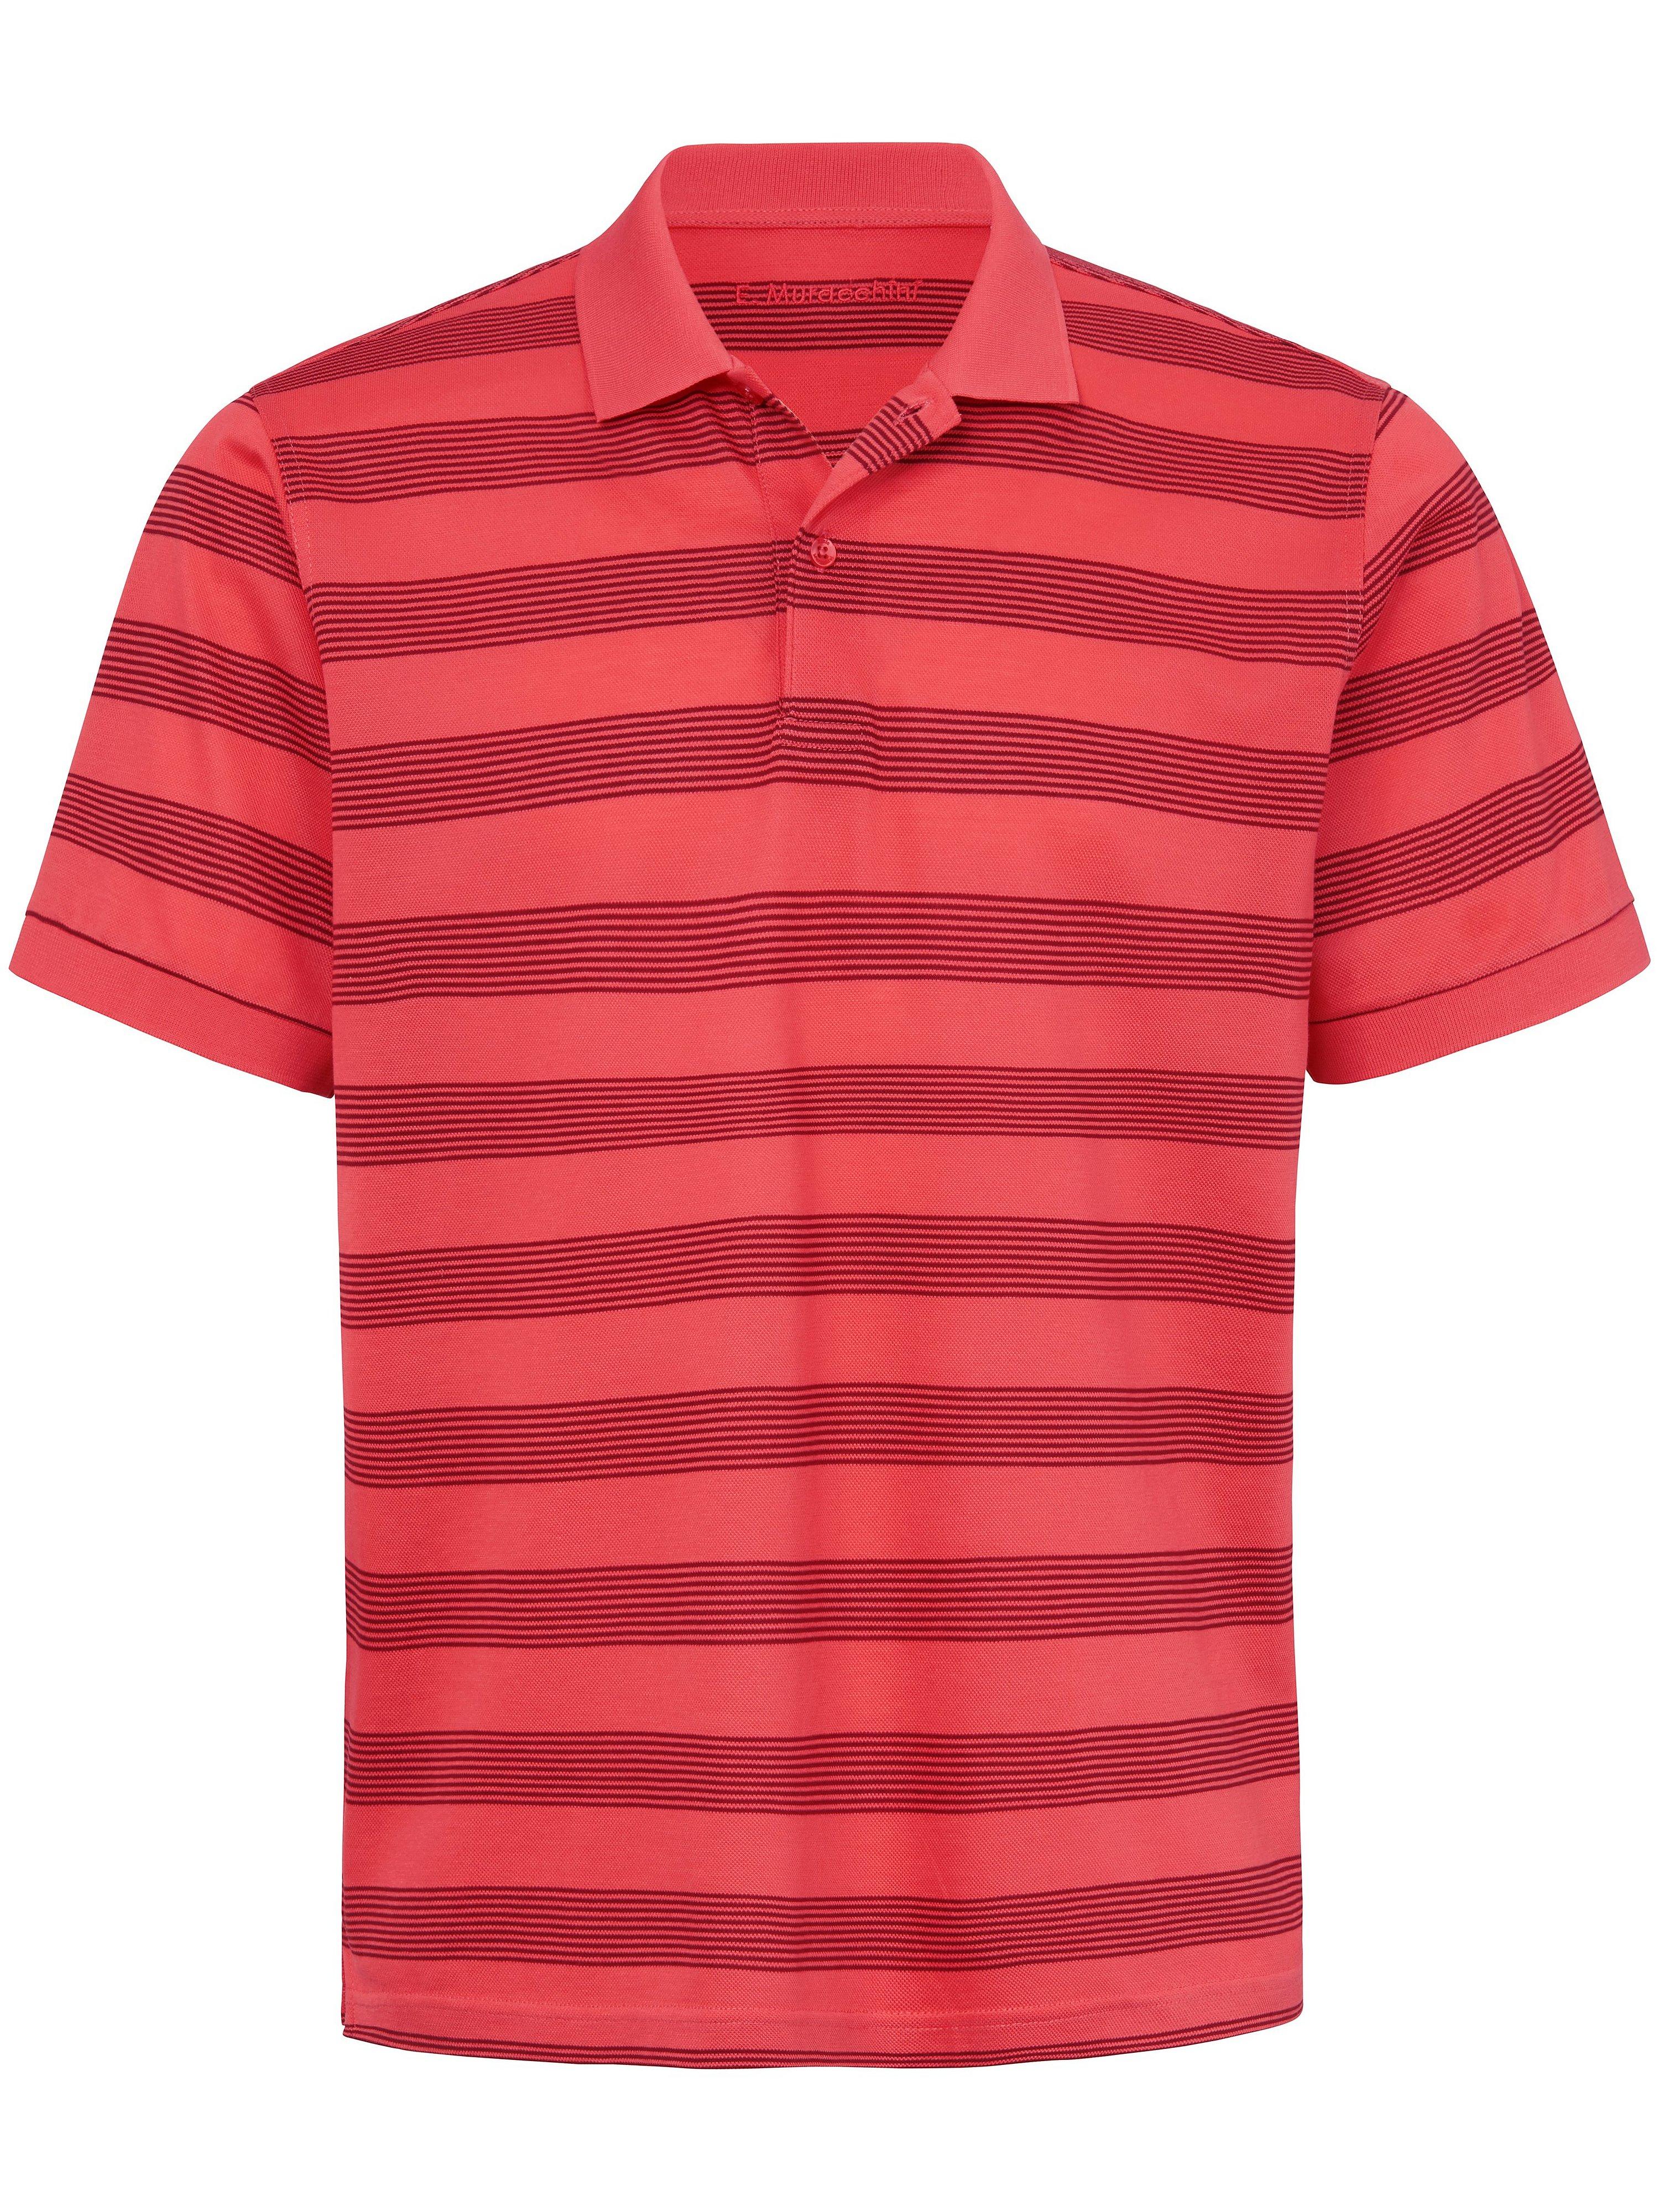 e.muracchini - Polo-Shirt  rot